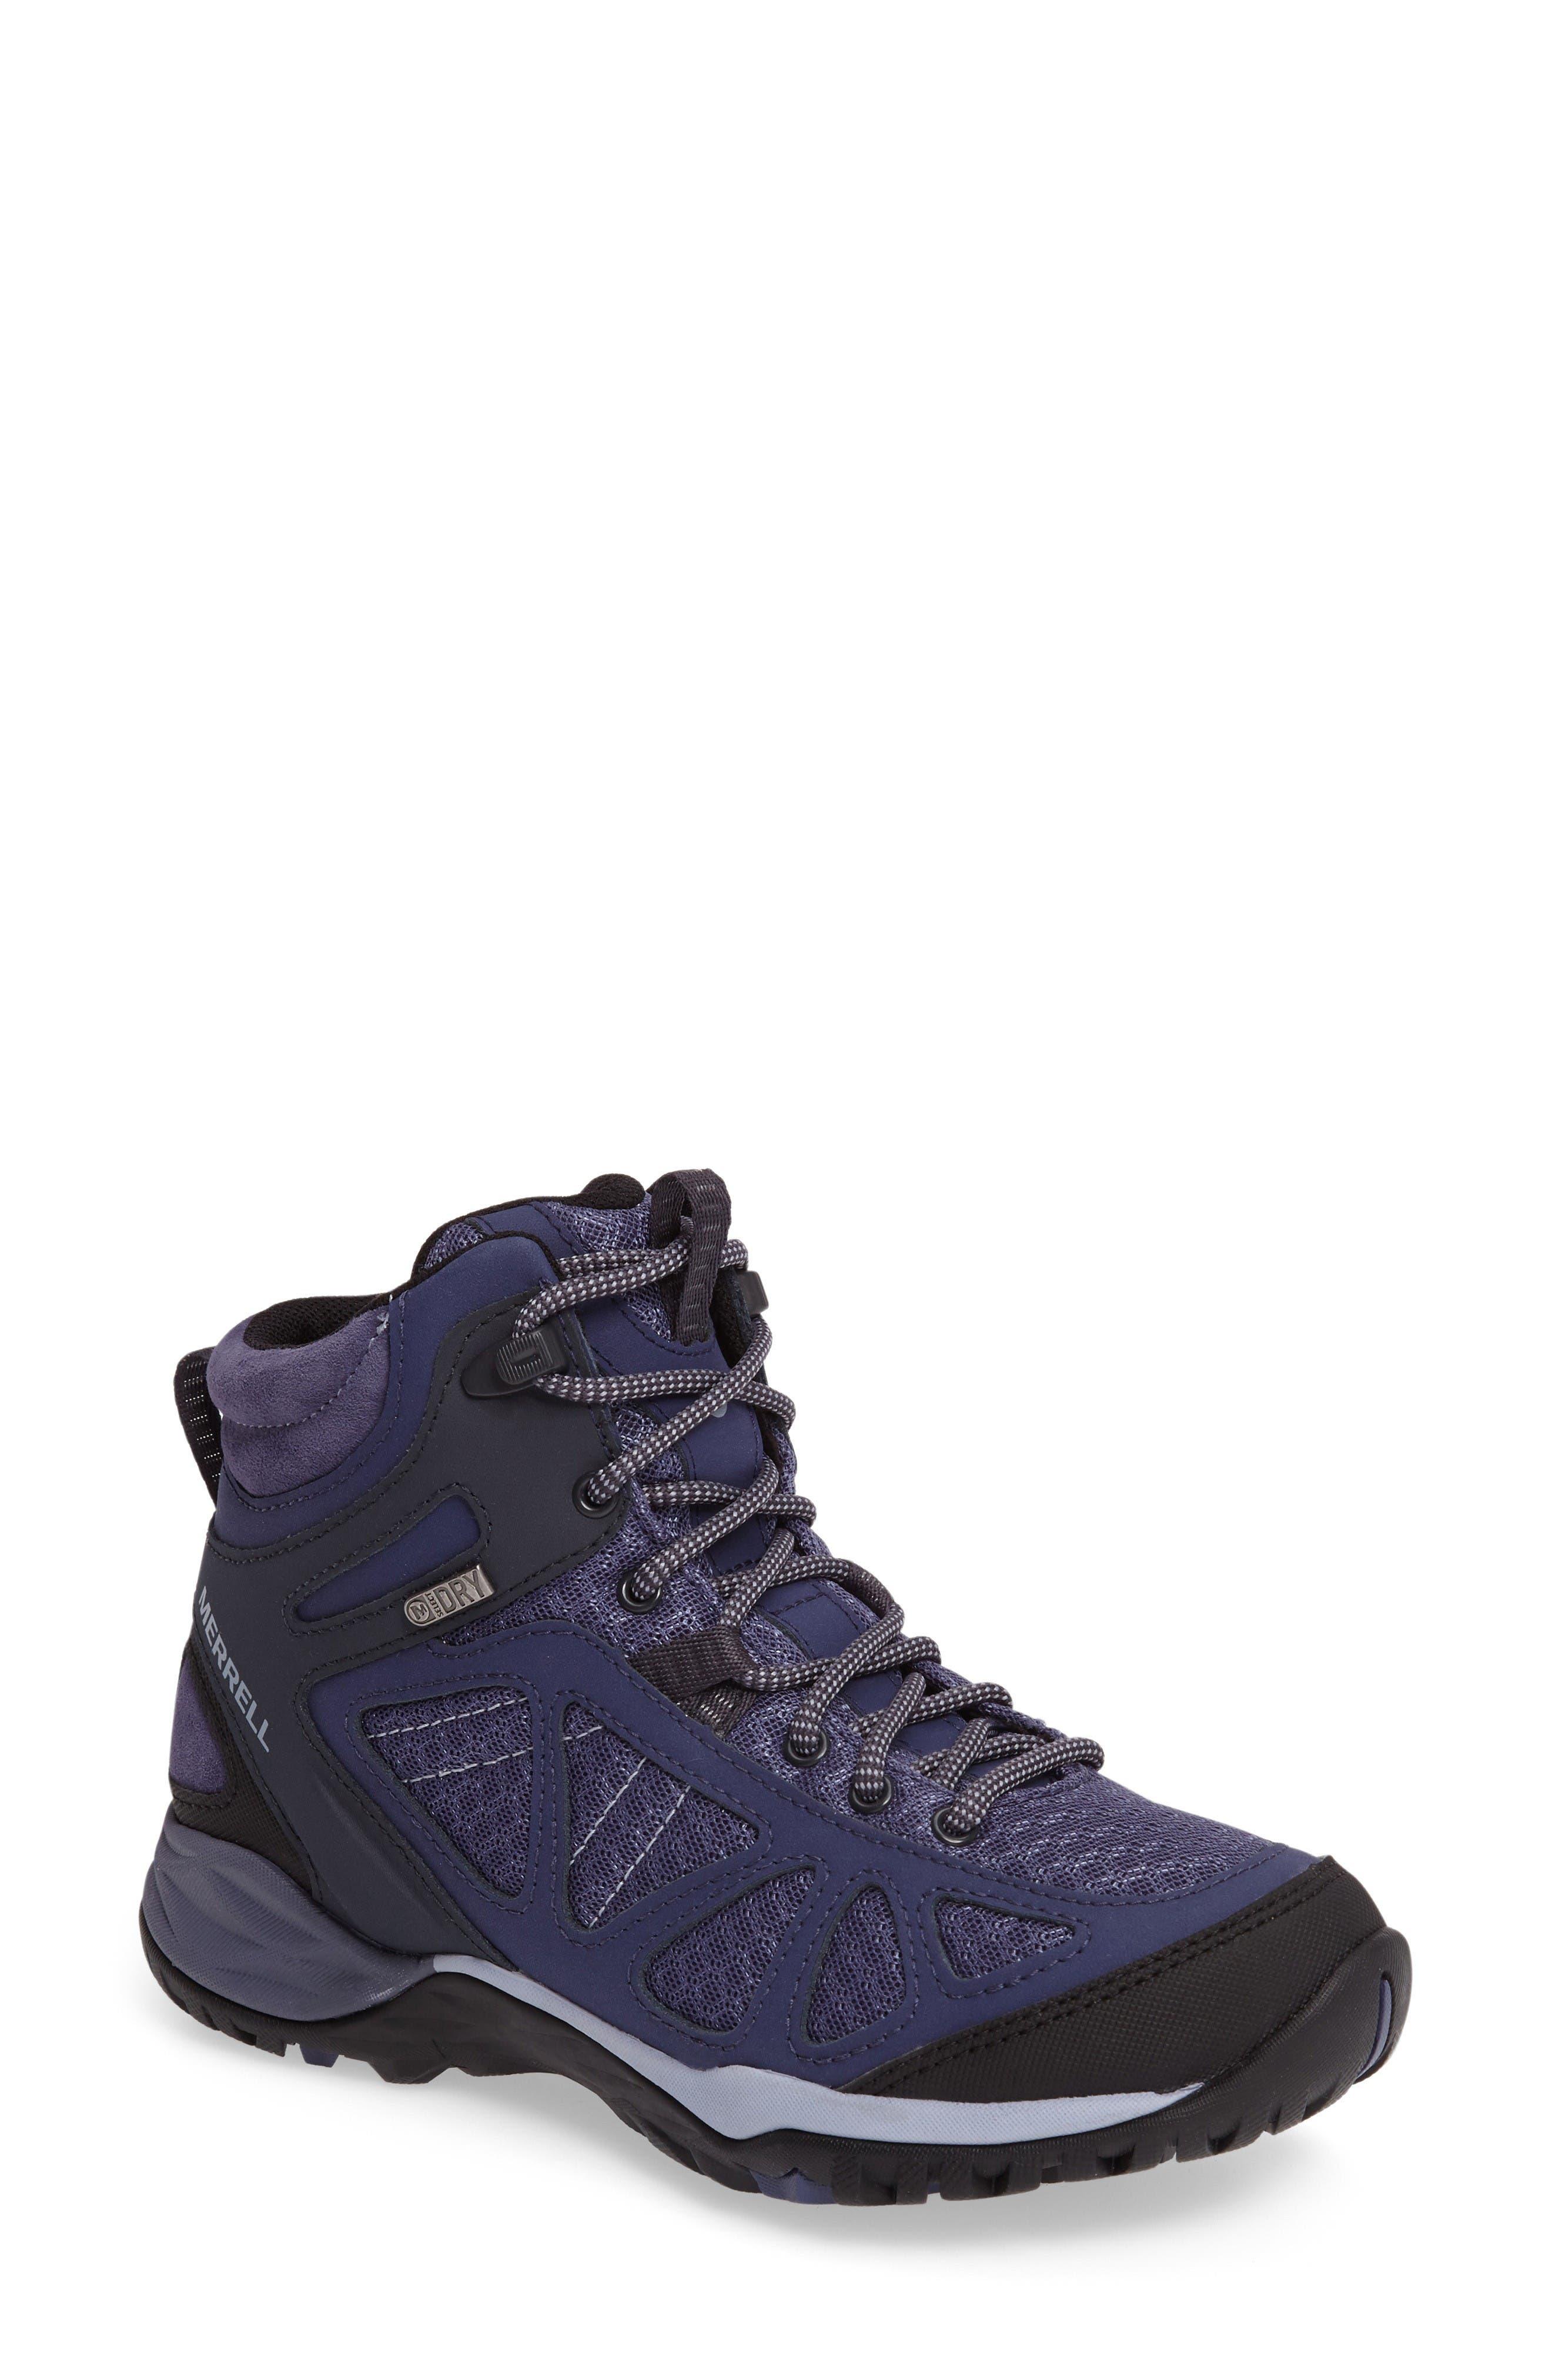 Siren Sport Q2 Waterproof Mid Top Sneaker,                         Main,                         color, Crown Blue Nubuck Leather